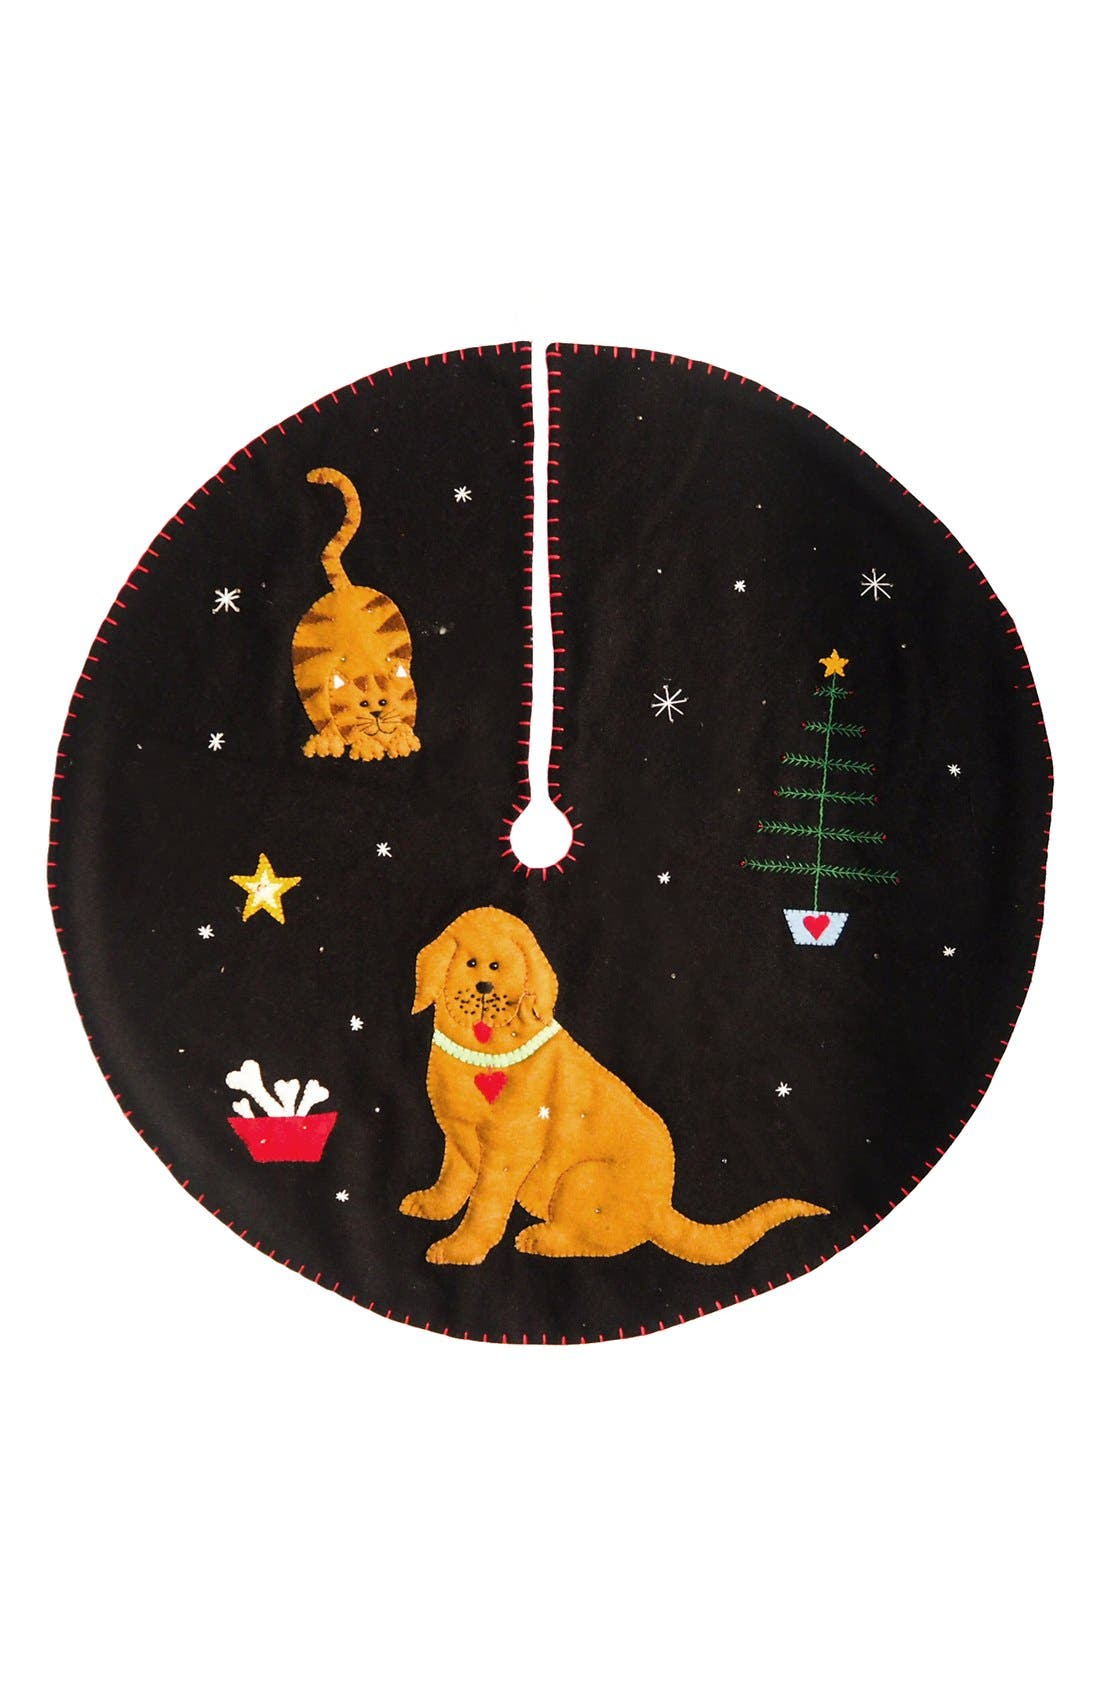 NEW WORLD ARTS,                             Dog & Cat Tree Skirt,                             Main thumbnail 1, color,                             001